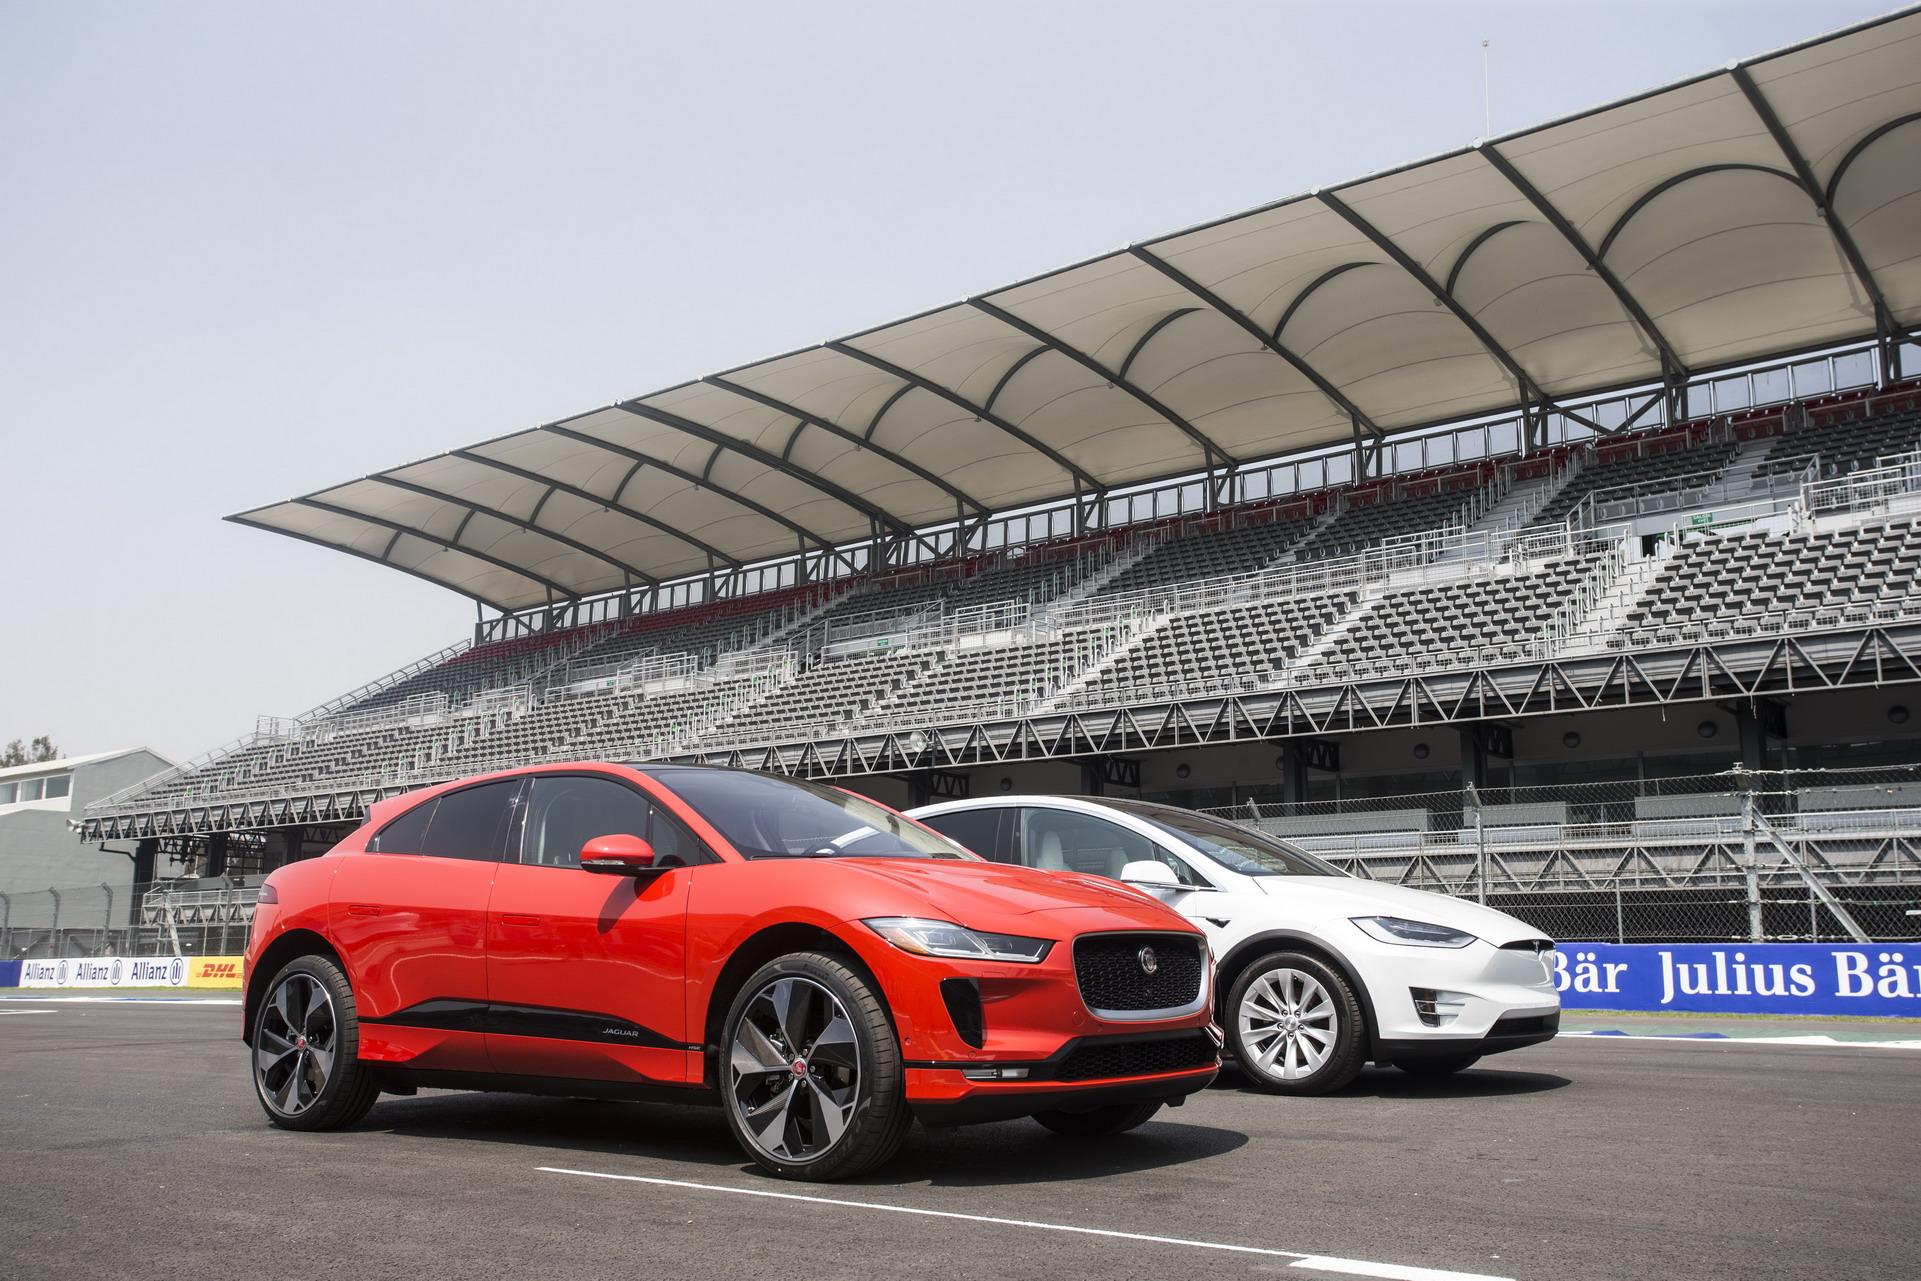 Geneva International Motor Show, New-Jaguar-i-Pace-123: Jaguar I-Pace : Siap Melawan Tesla Model X